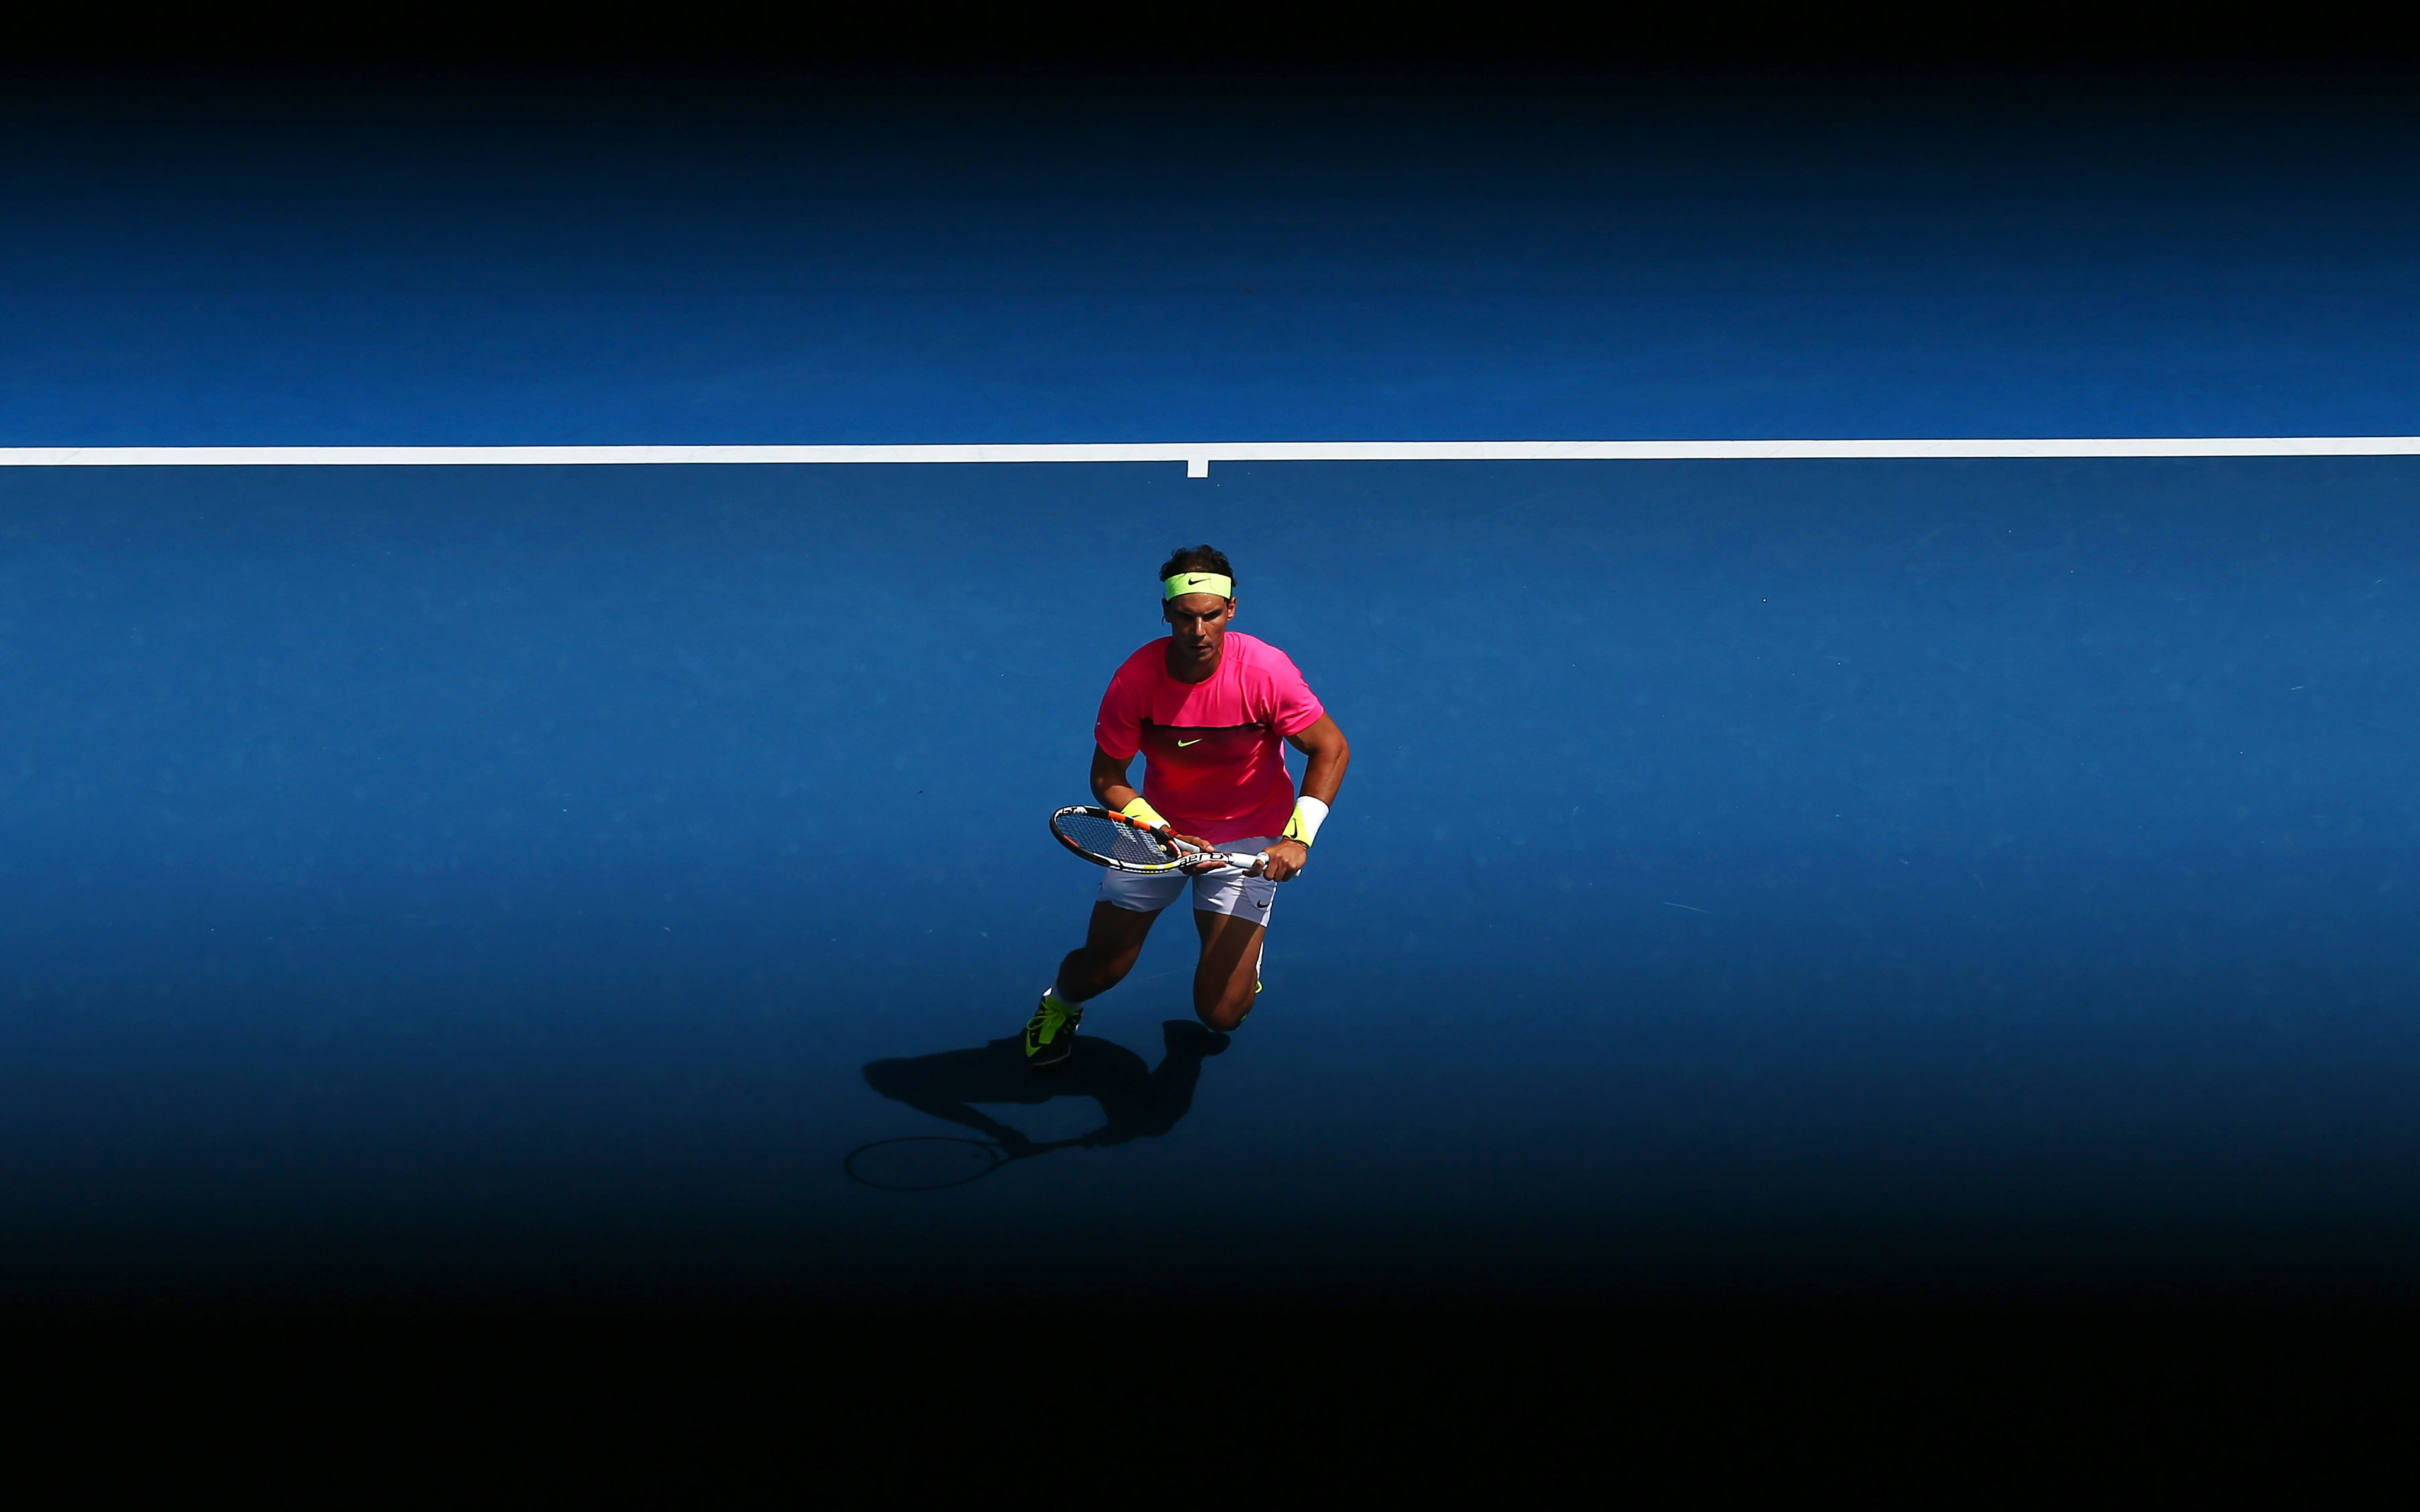 Download 3840x2400 Wallpaper Sports, Tennis Player